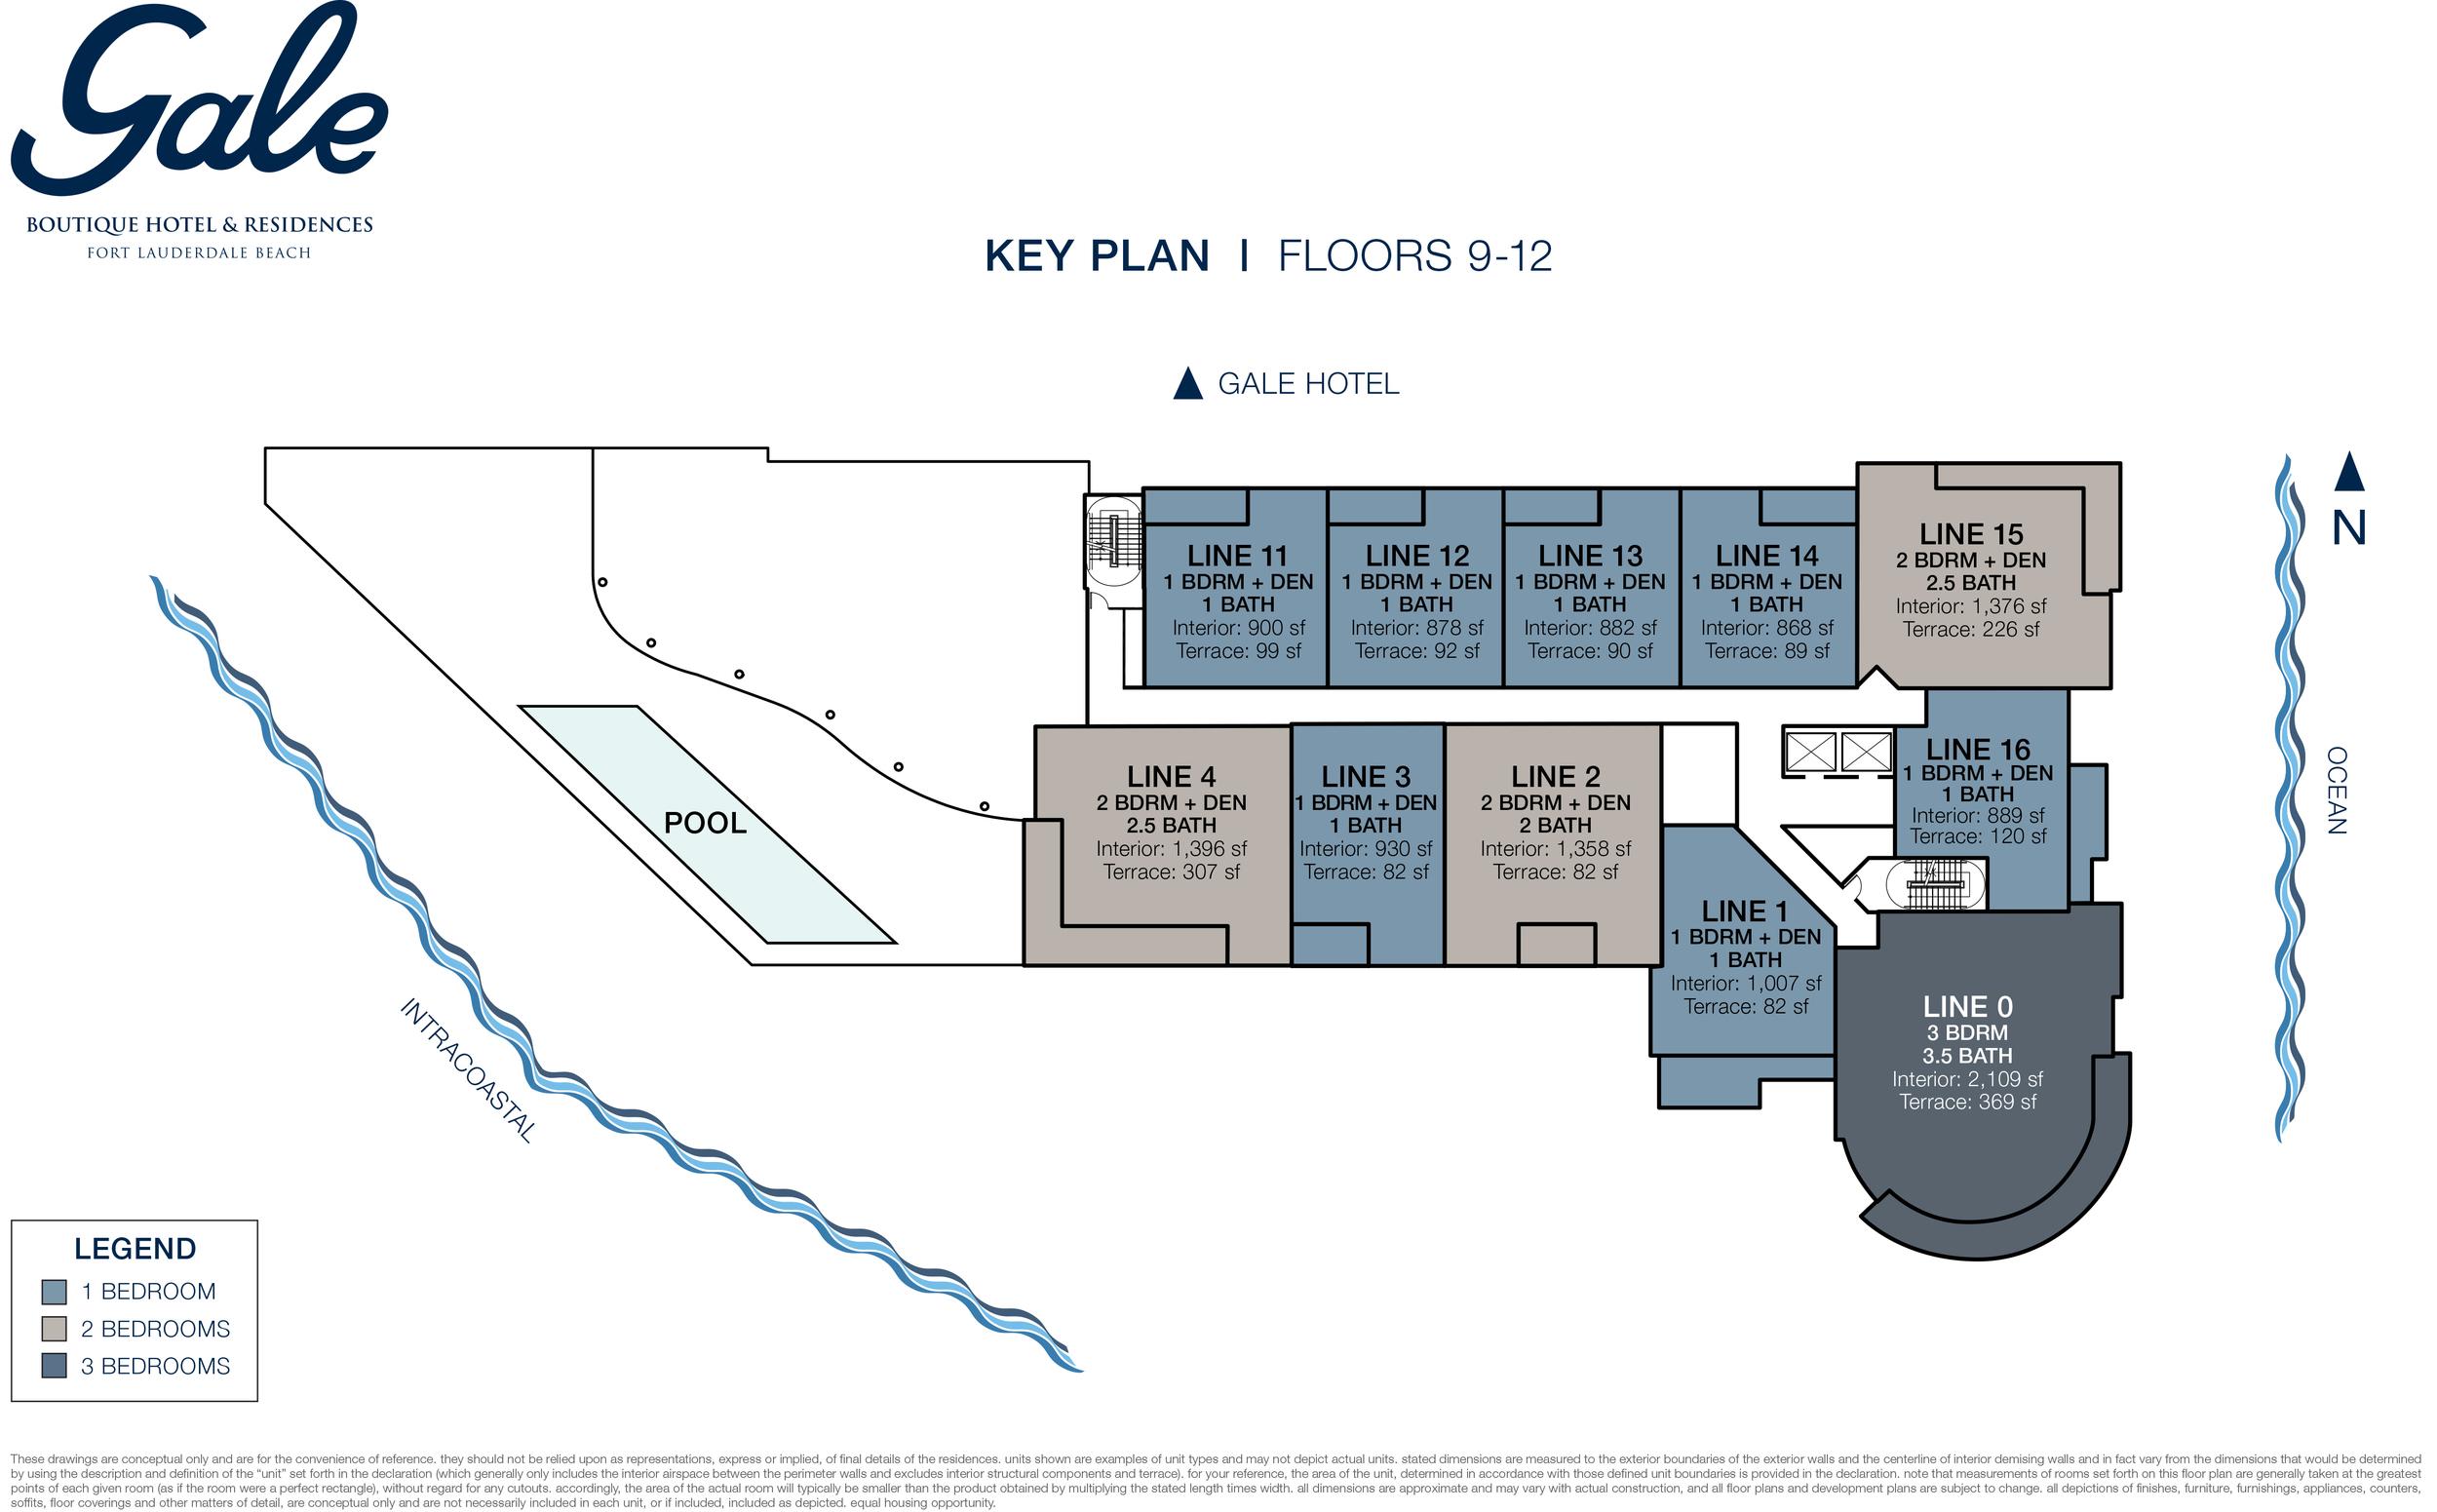 Gale Boutique Hotel & Residences Ft.Lauderdale Floors 9-12 Key Plan